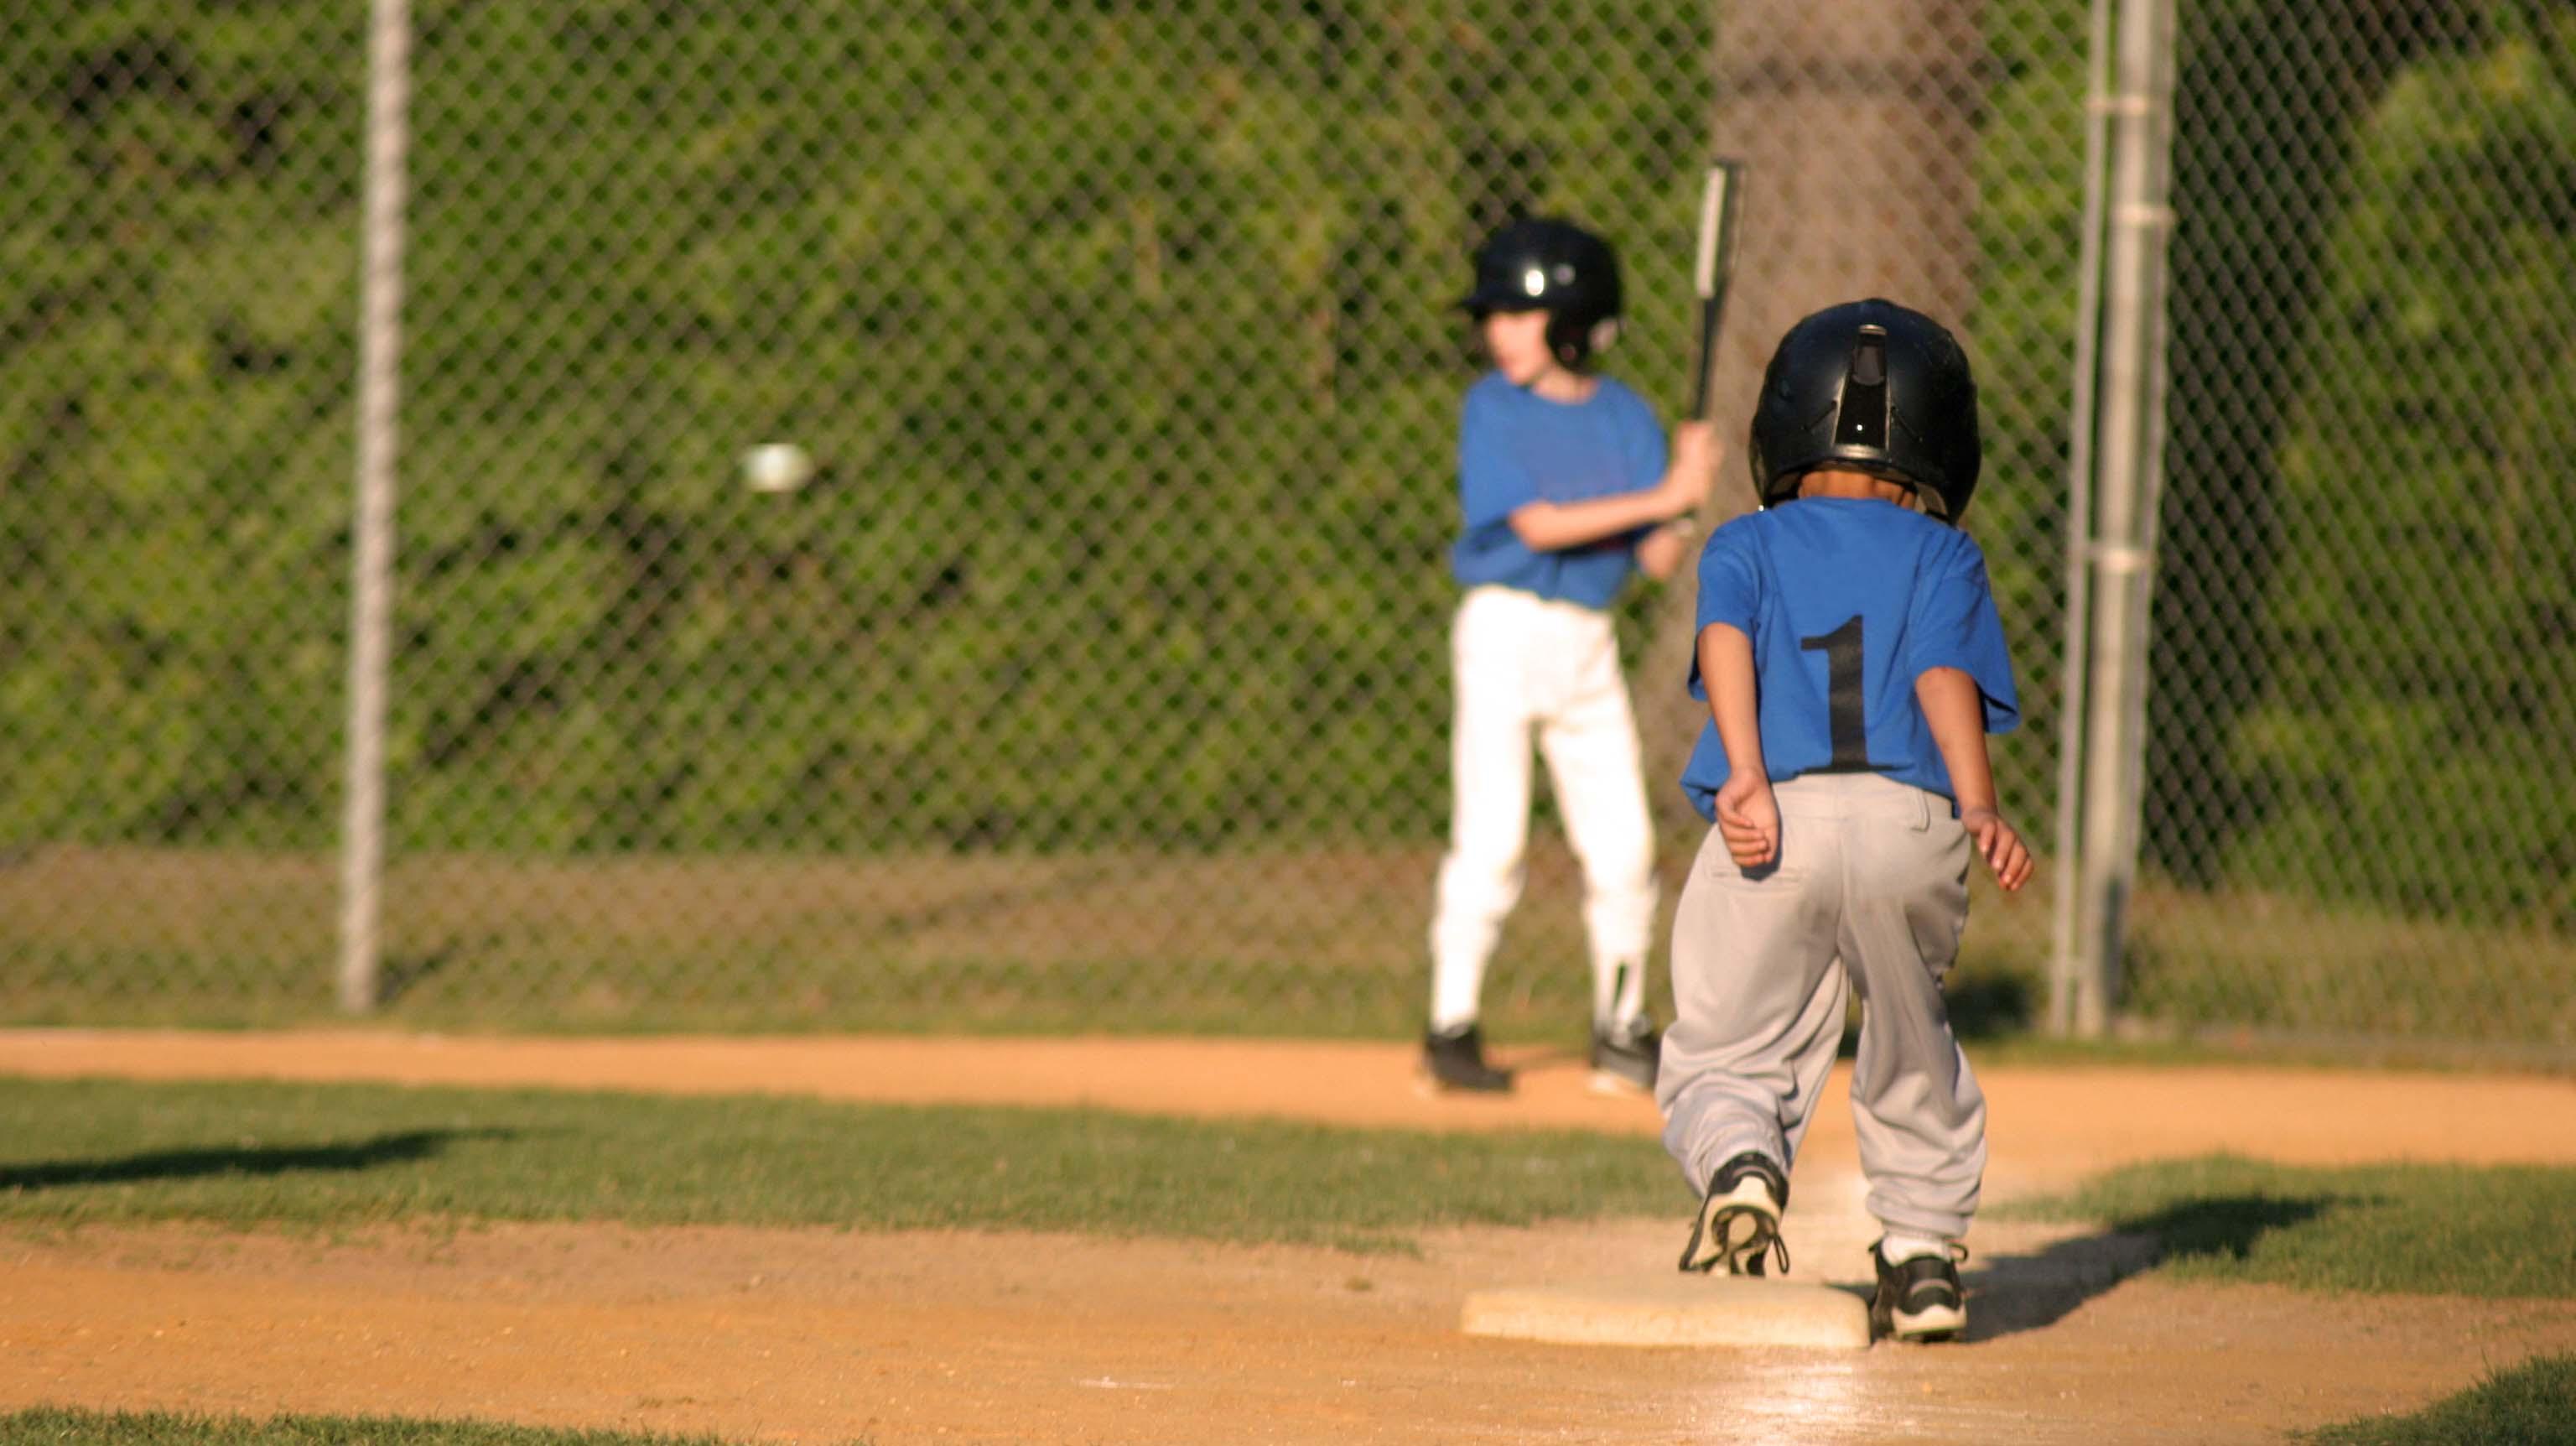 Baseball Skills Development